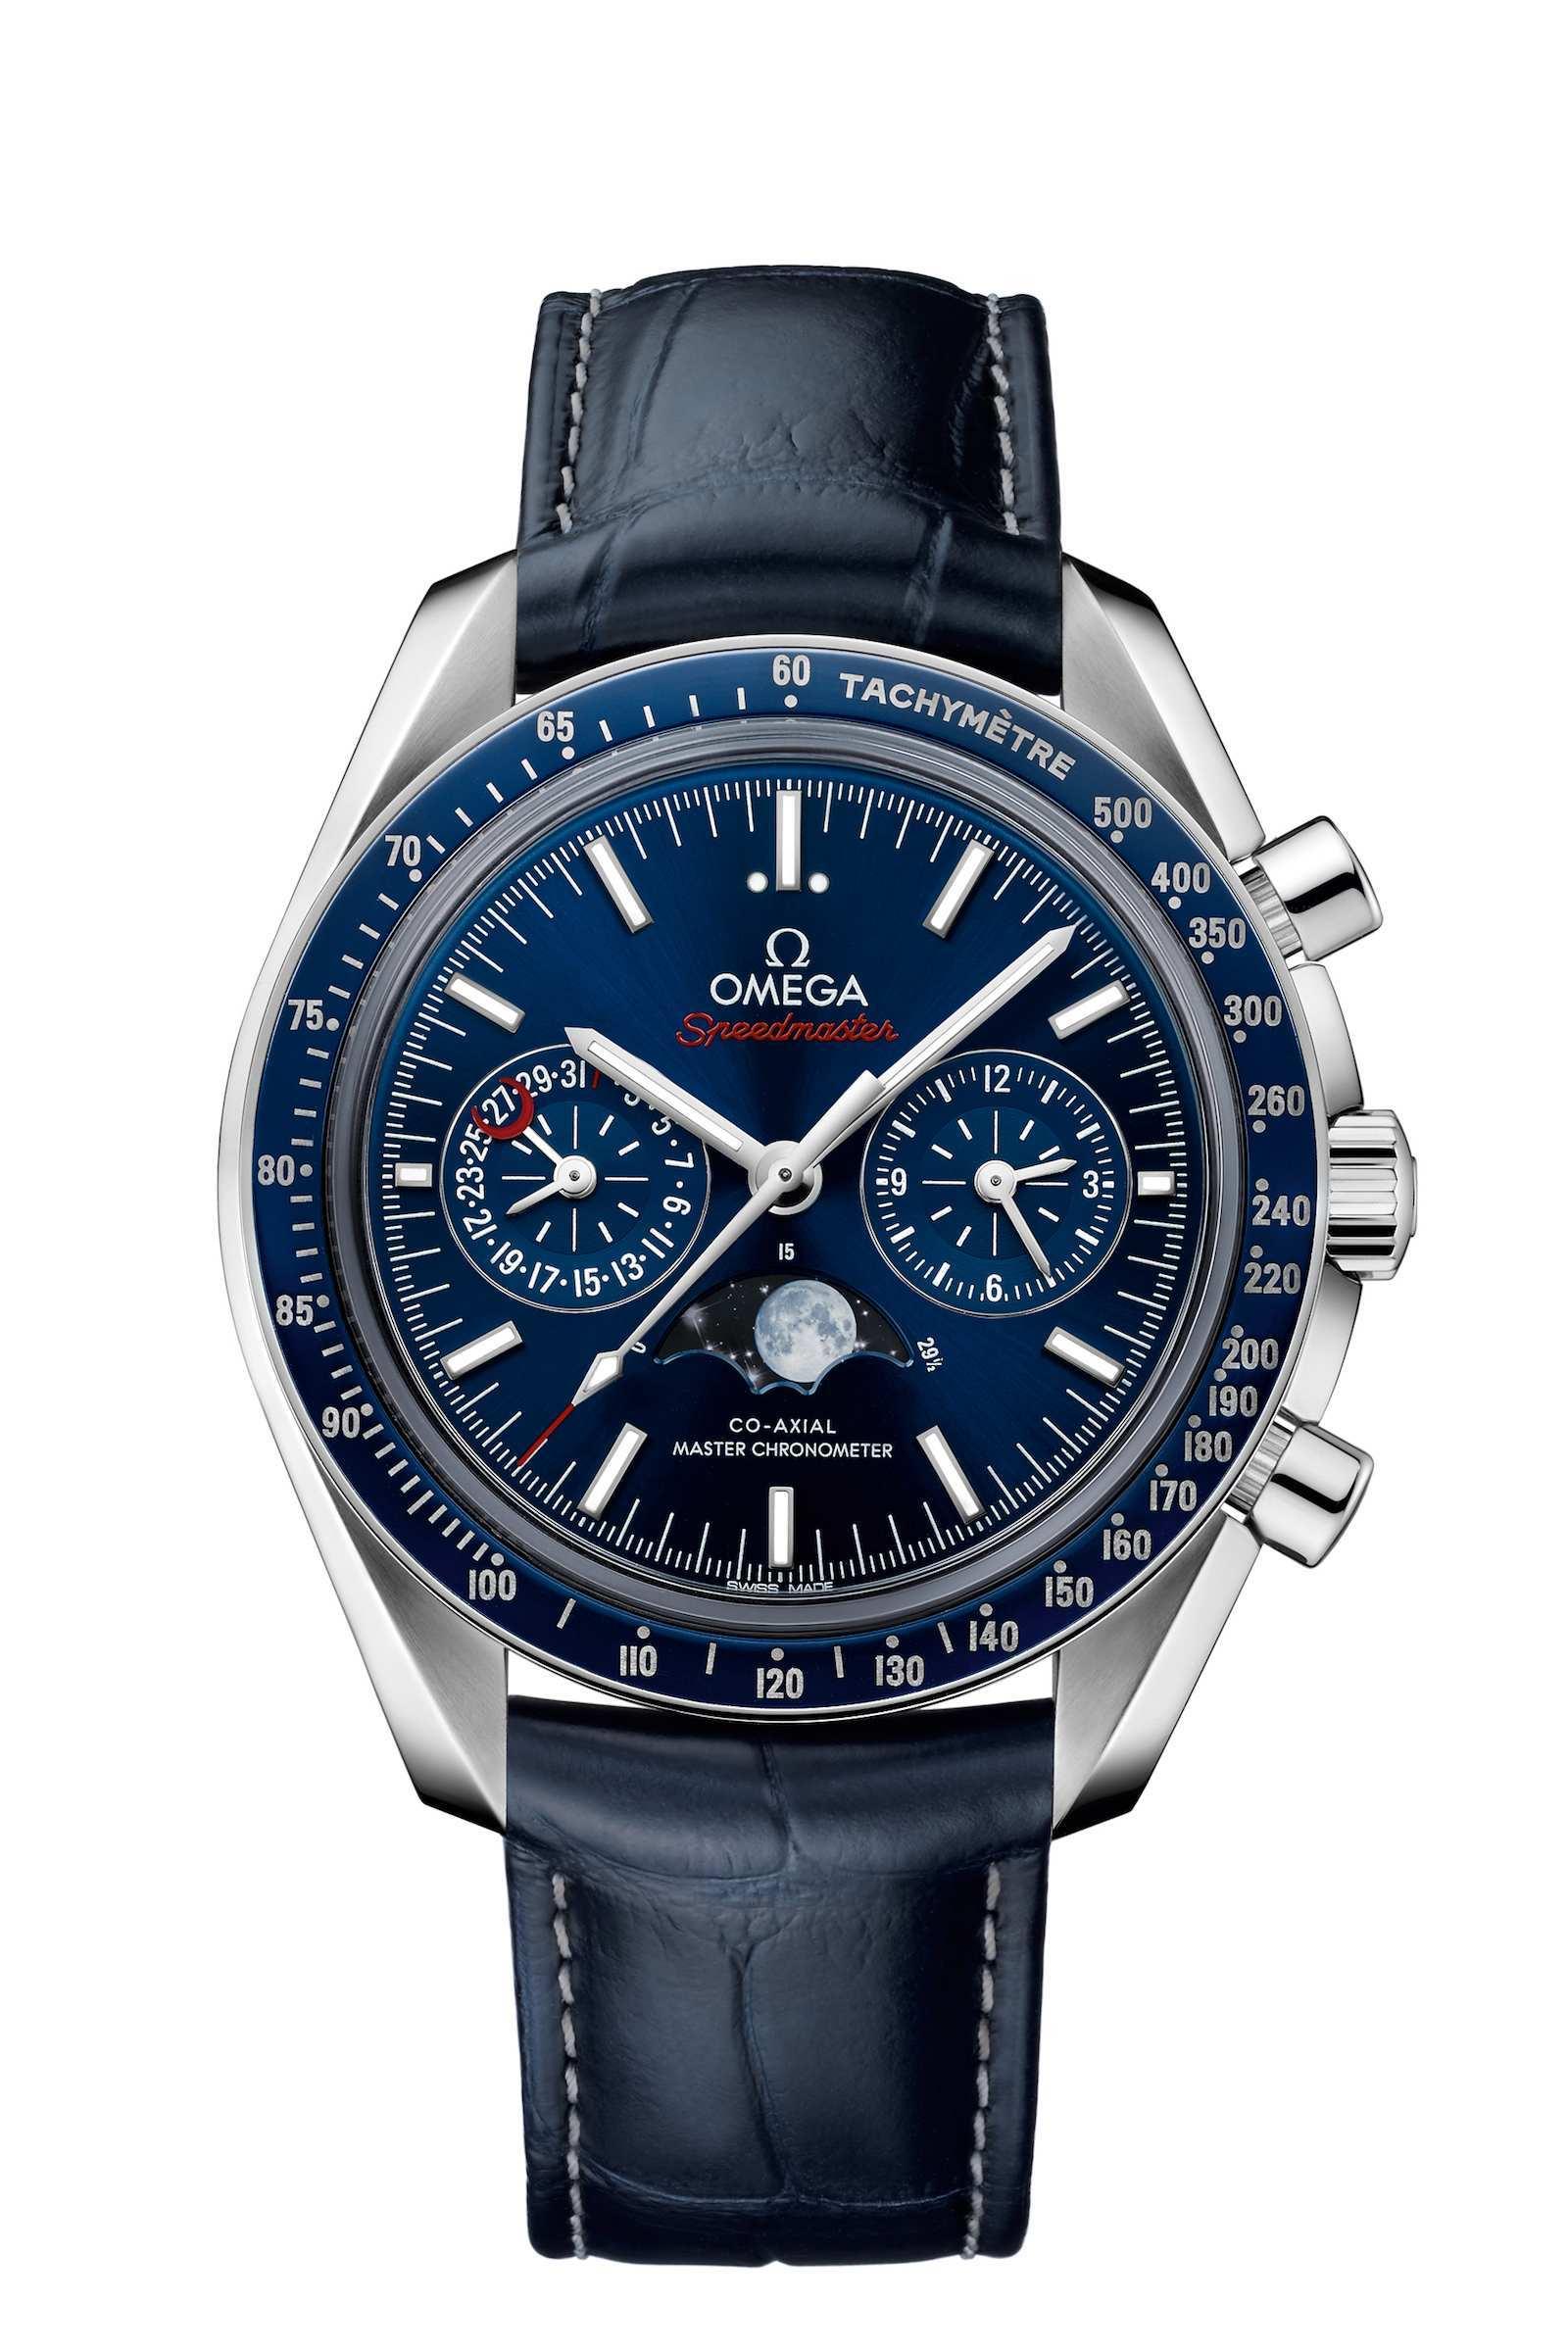 Omega – Pre Basel 2016 – Speedmaster Moonphase Chronograph Master Chronometer y Seamaster Planet Ocean 600m Master Chronometer